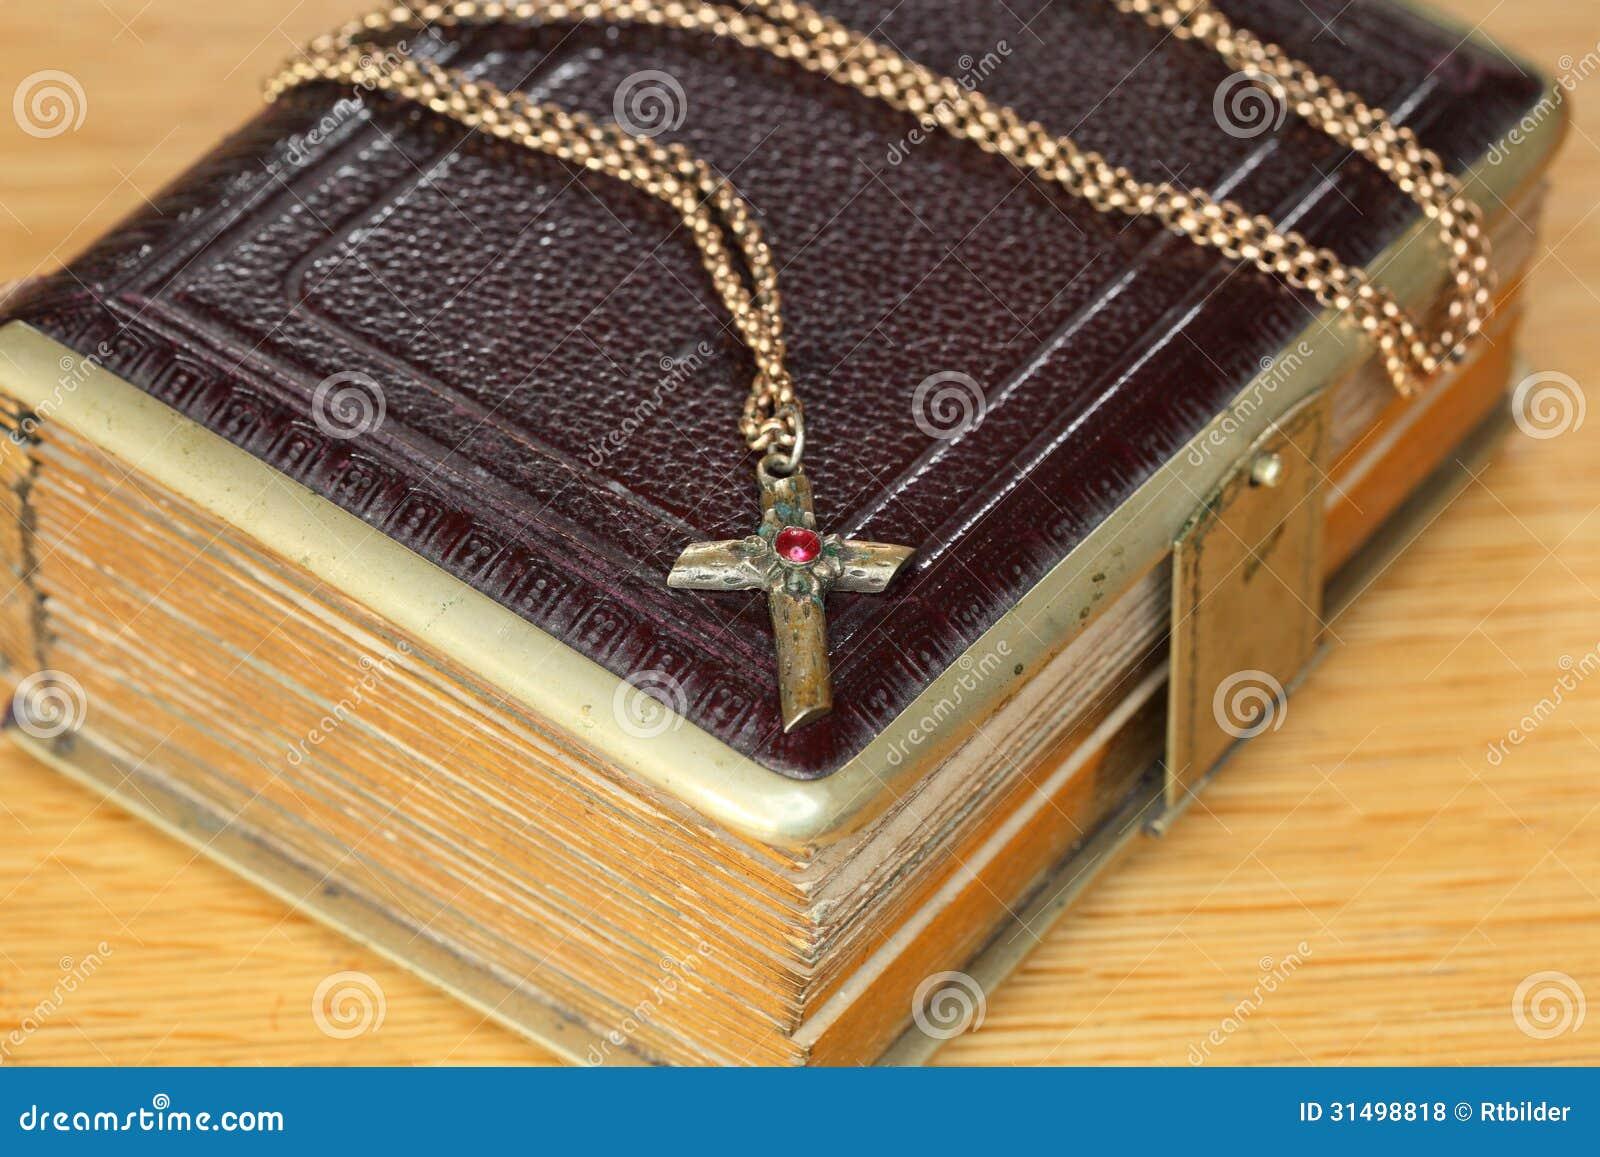 Religious Things Royalty Free Stock Photos Image 31498818